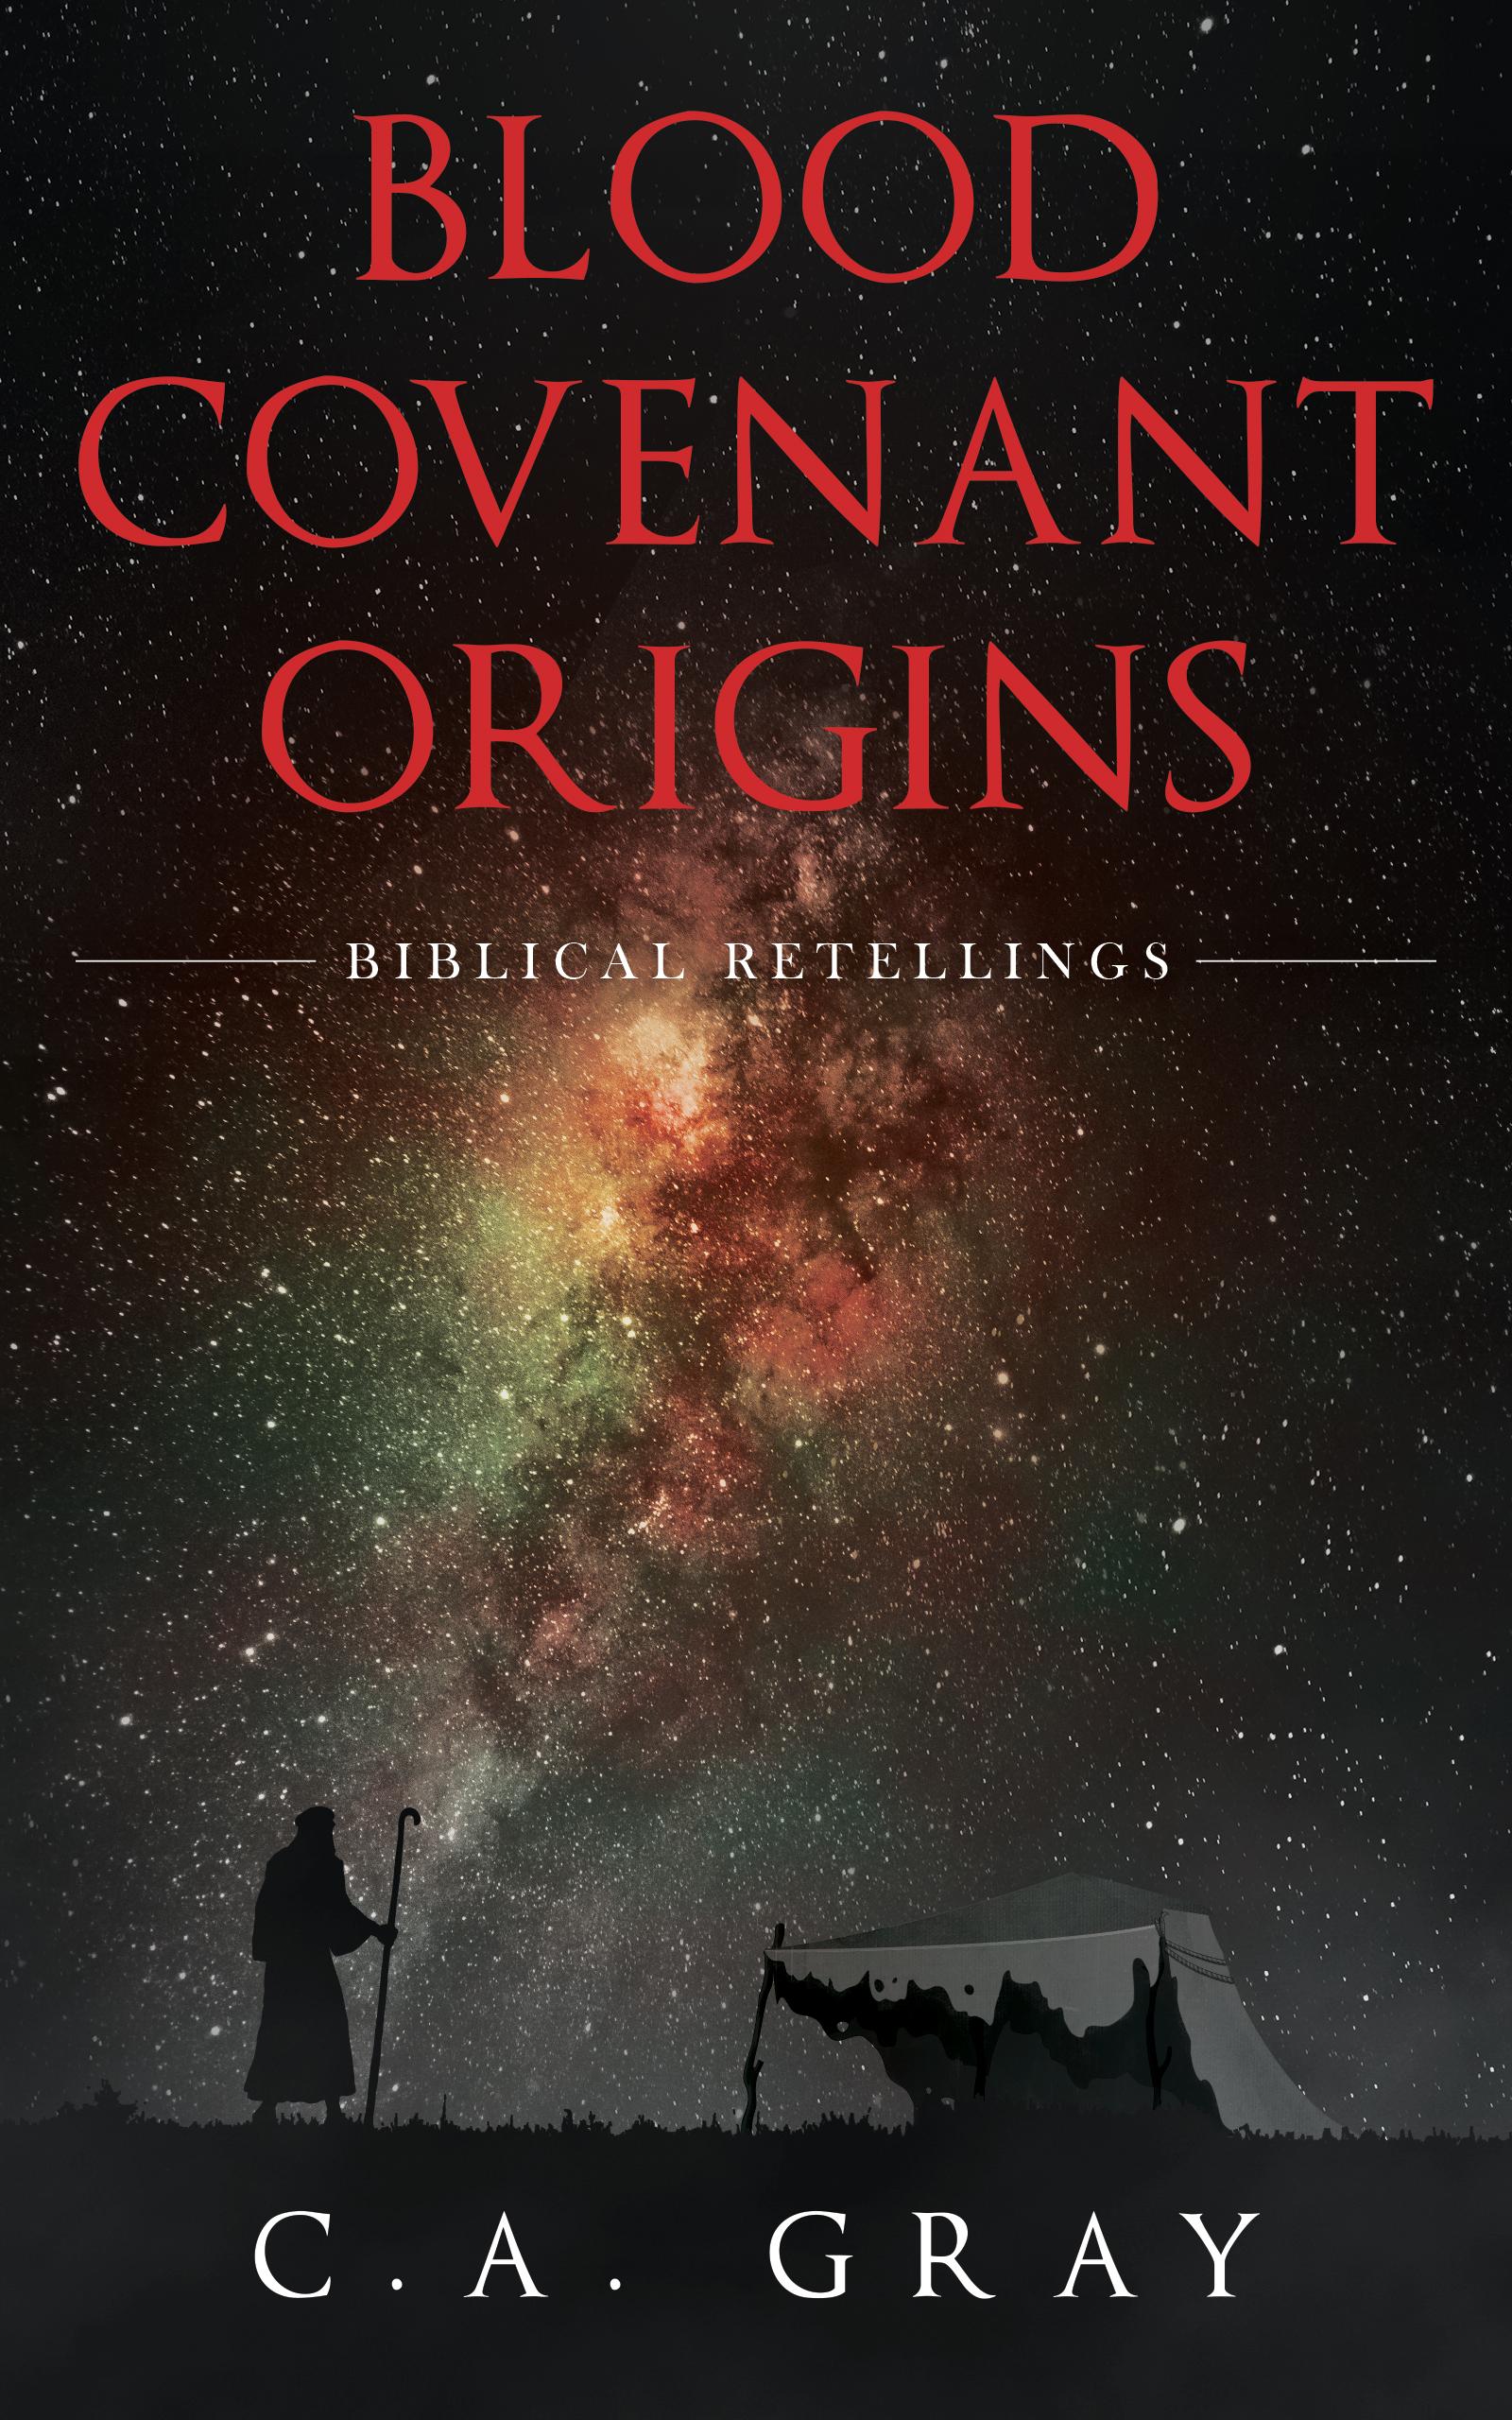 Blood Covenant Origins